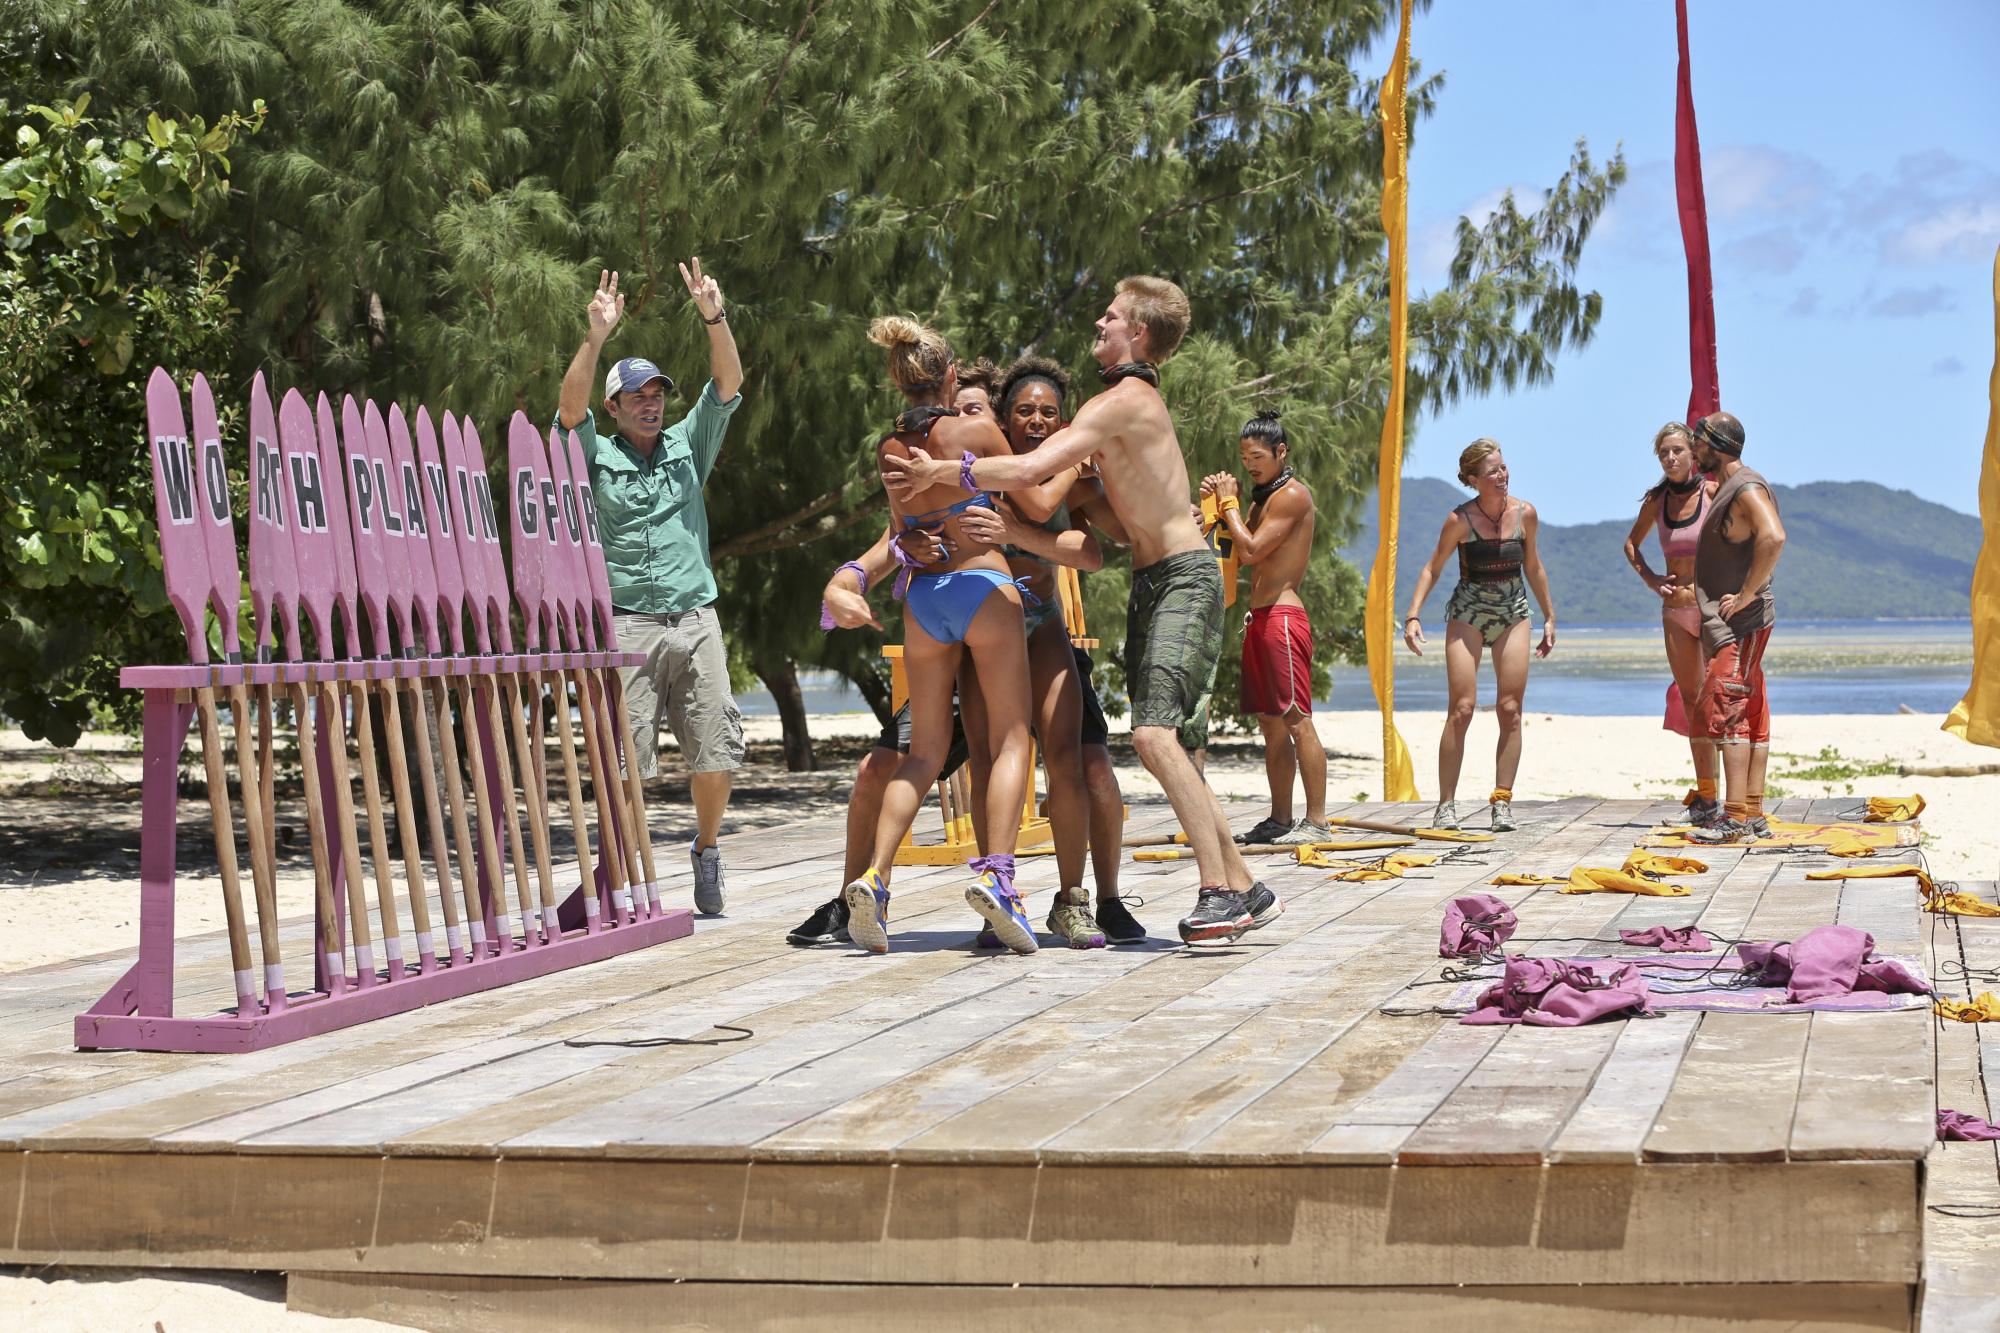 Celebrating winning the reward challenge in Season 28 Episode 9